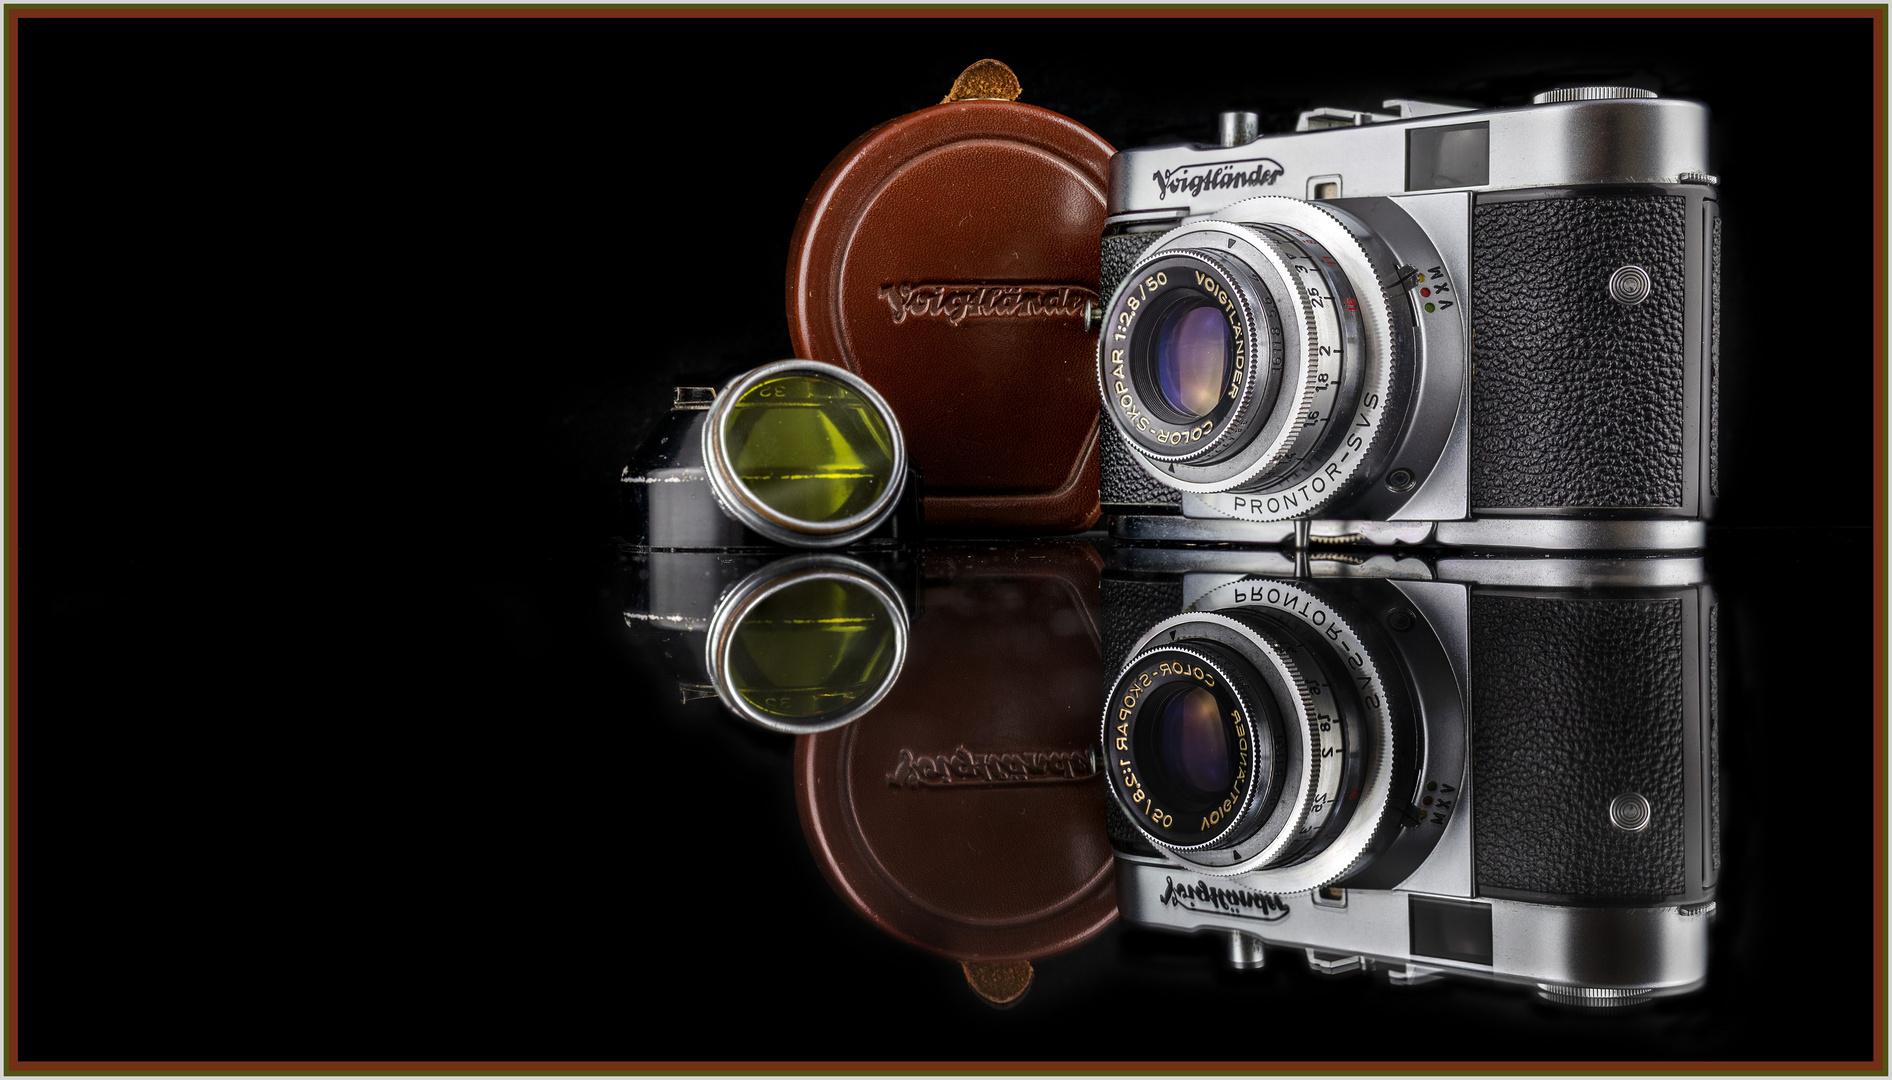 Papas erster Fotoapparat - analoges digital festgehalten